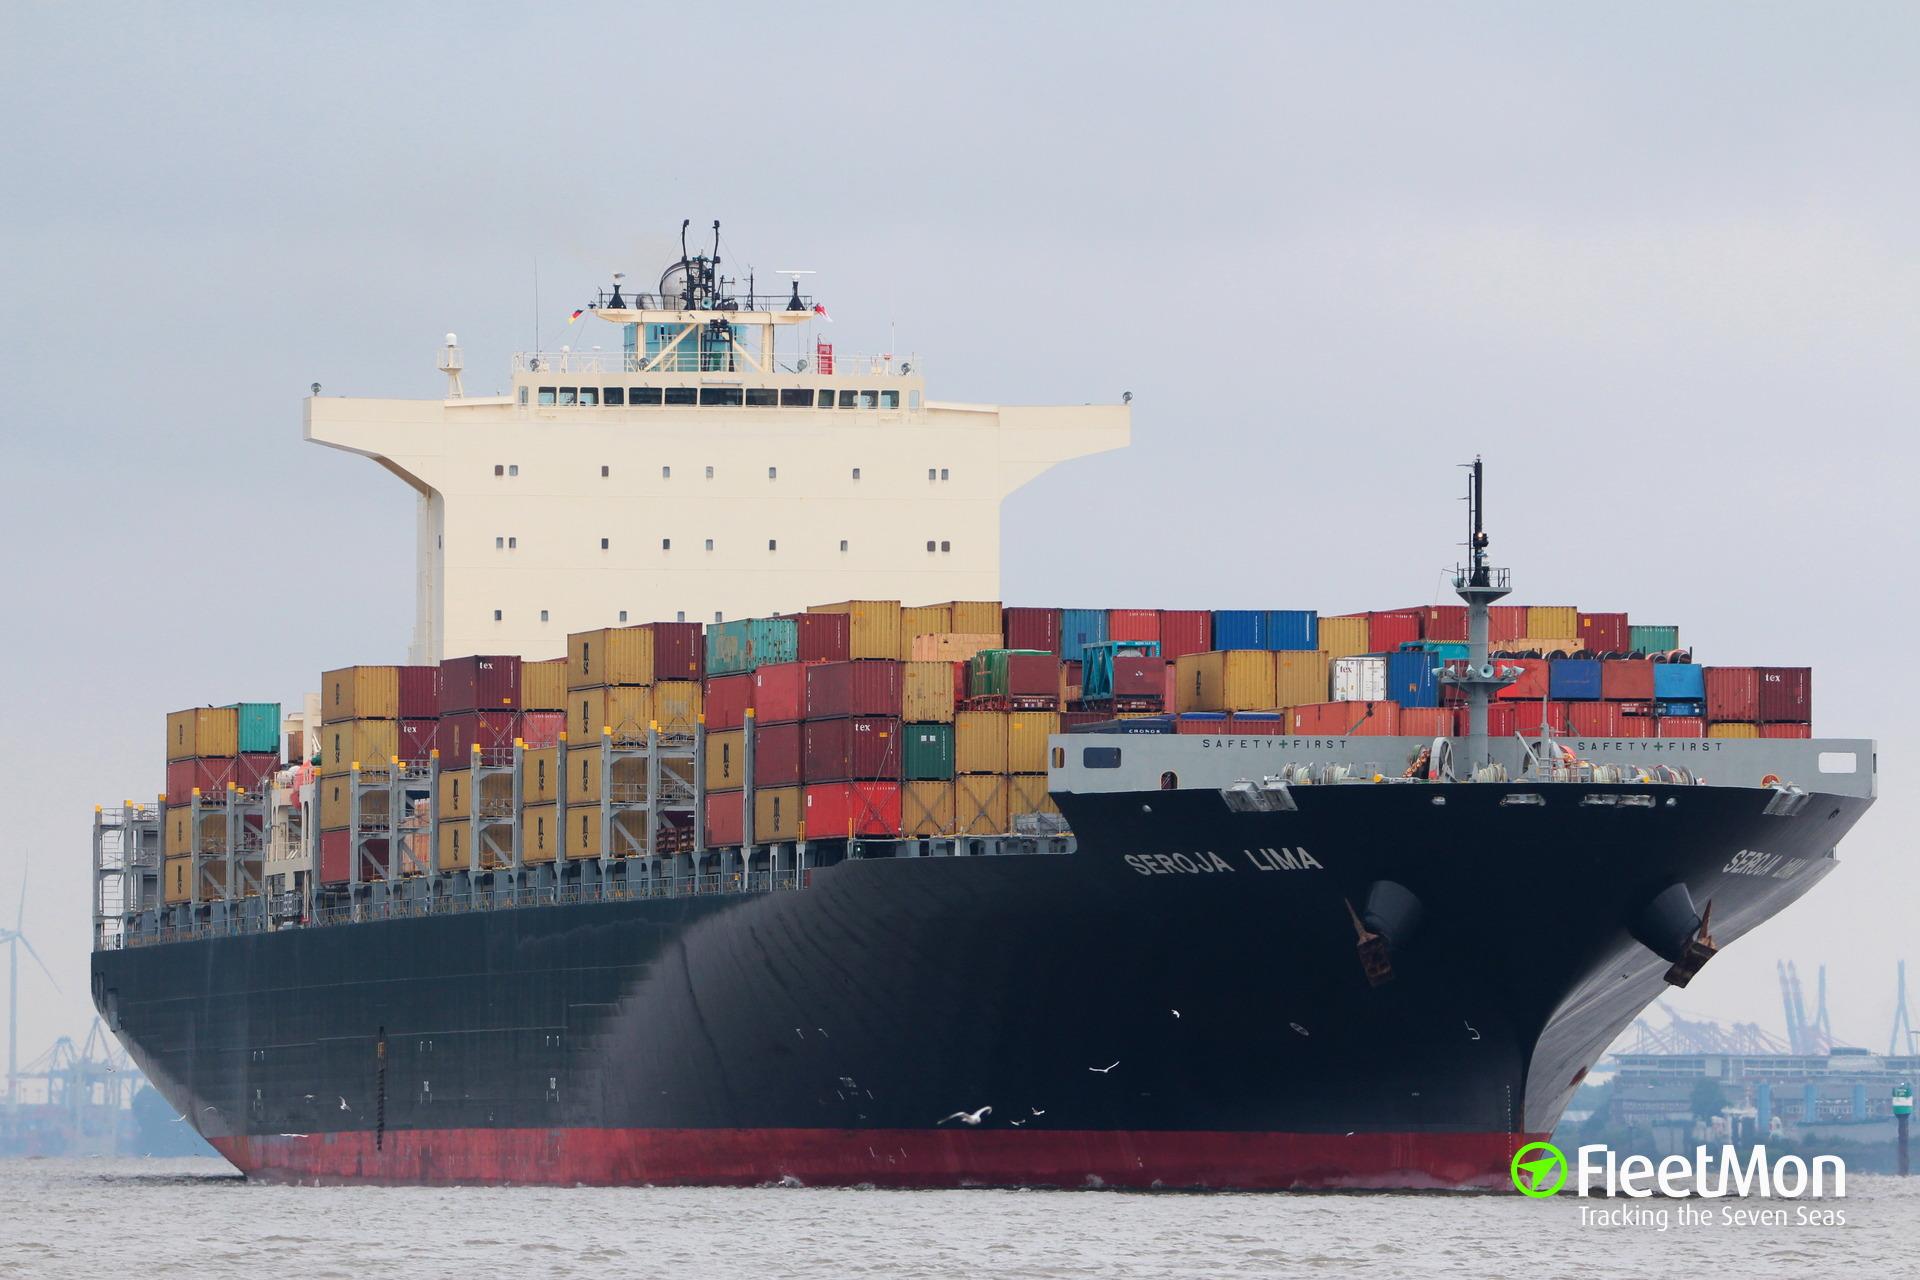 Boxship Seroja Lima lost 23 containers